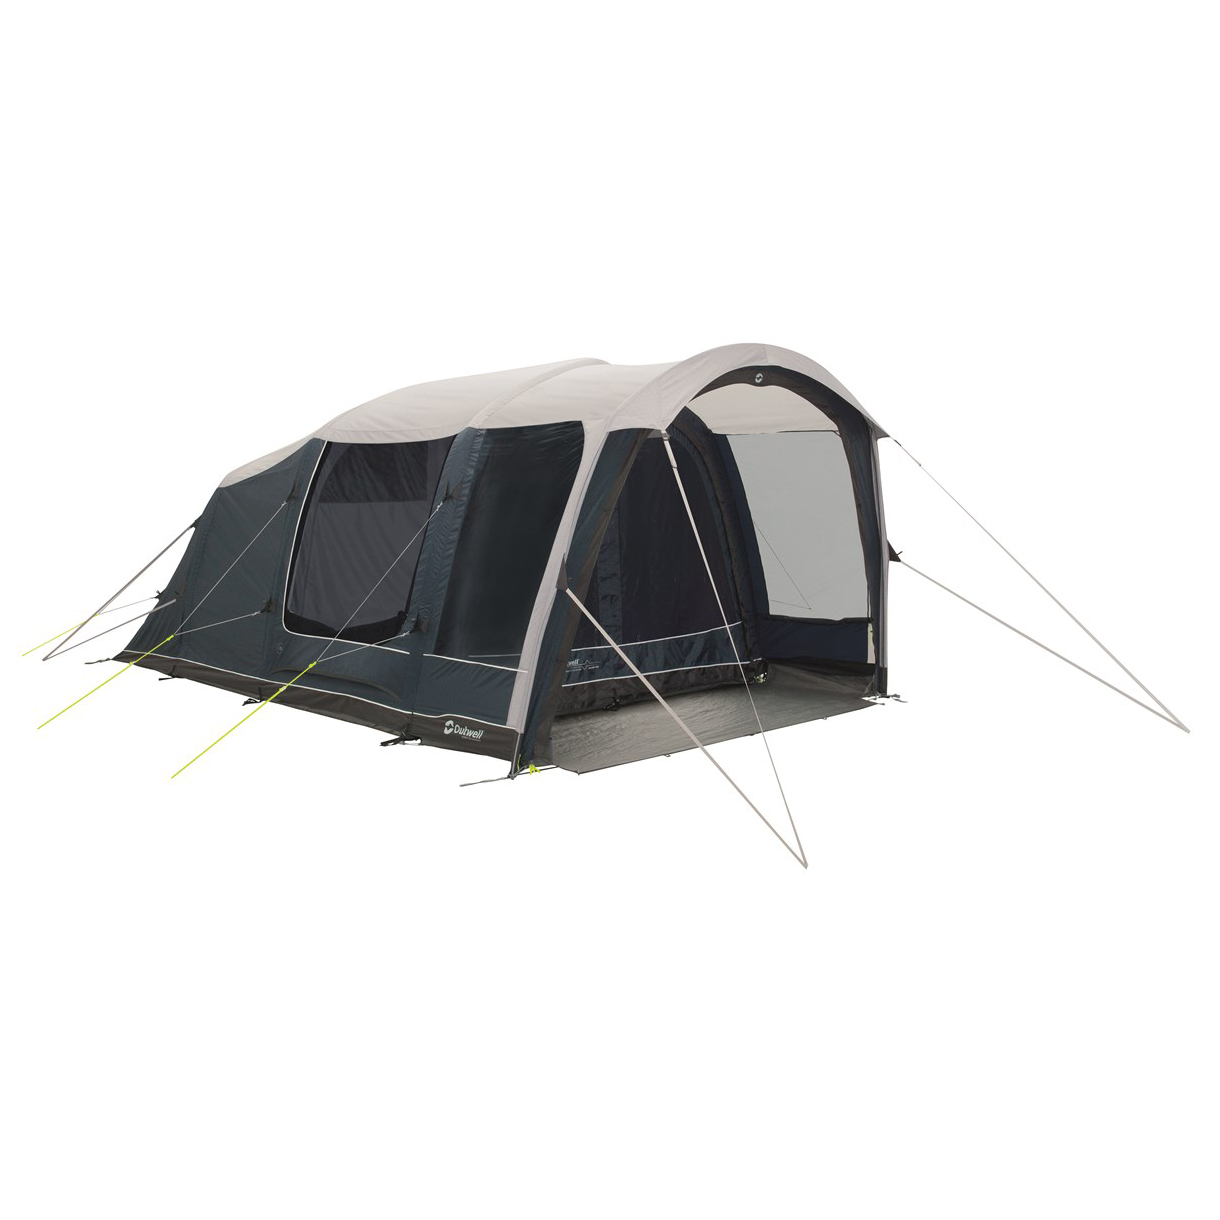 Outwell Roseville 4SA 4 Personen Zelt online kaufen